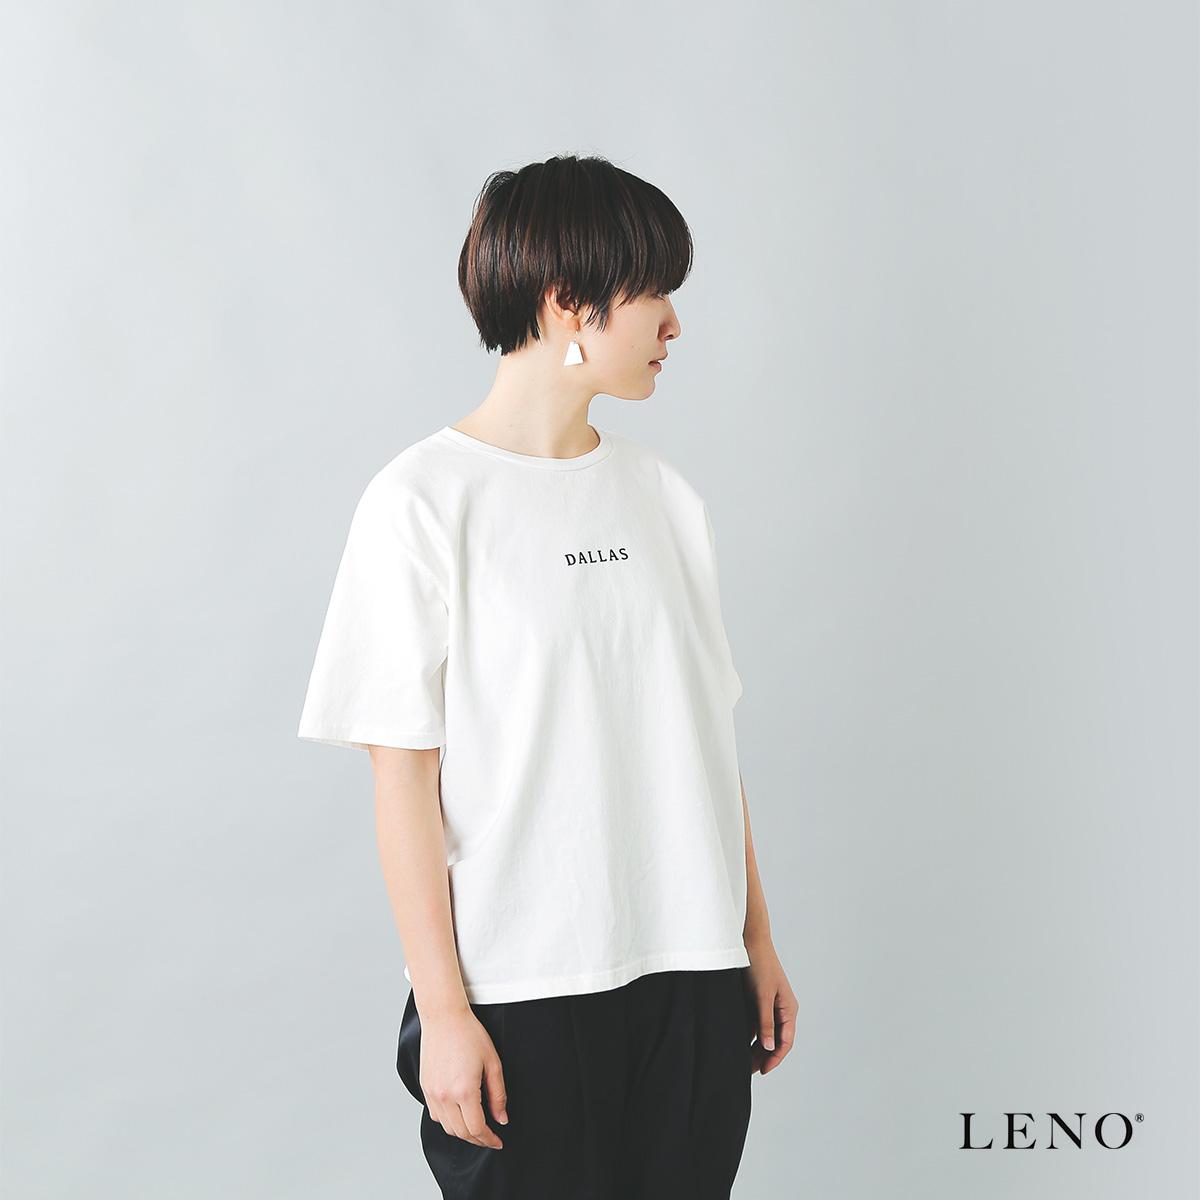 LENO(リノ)プリントTシャツ l2001-cs001